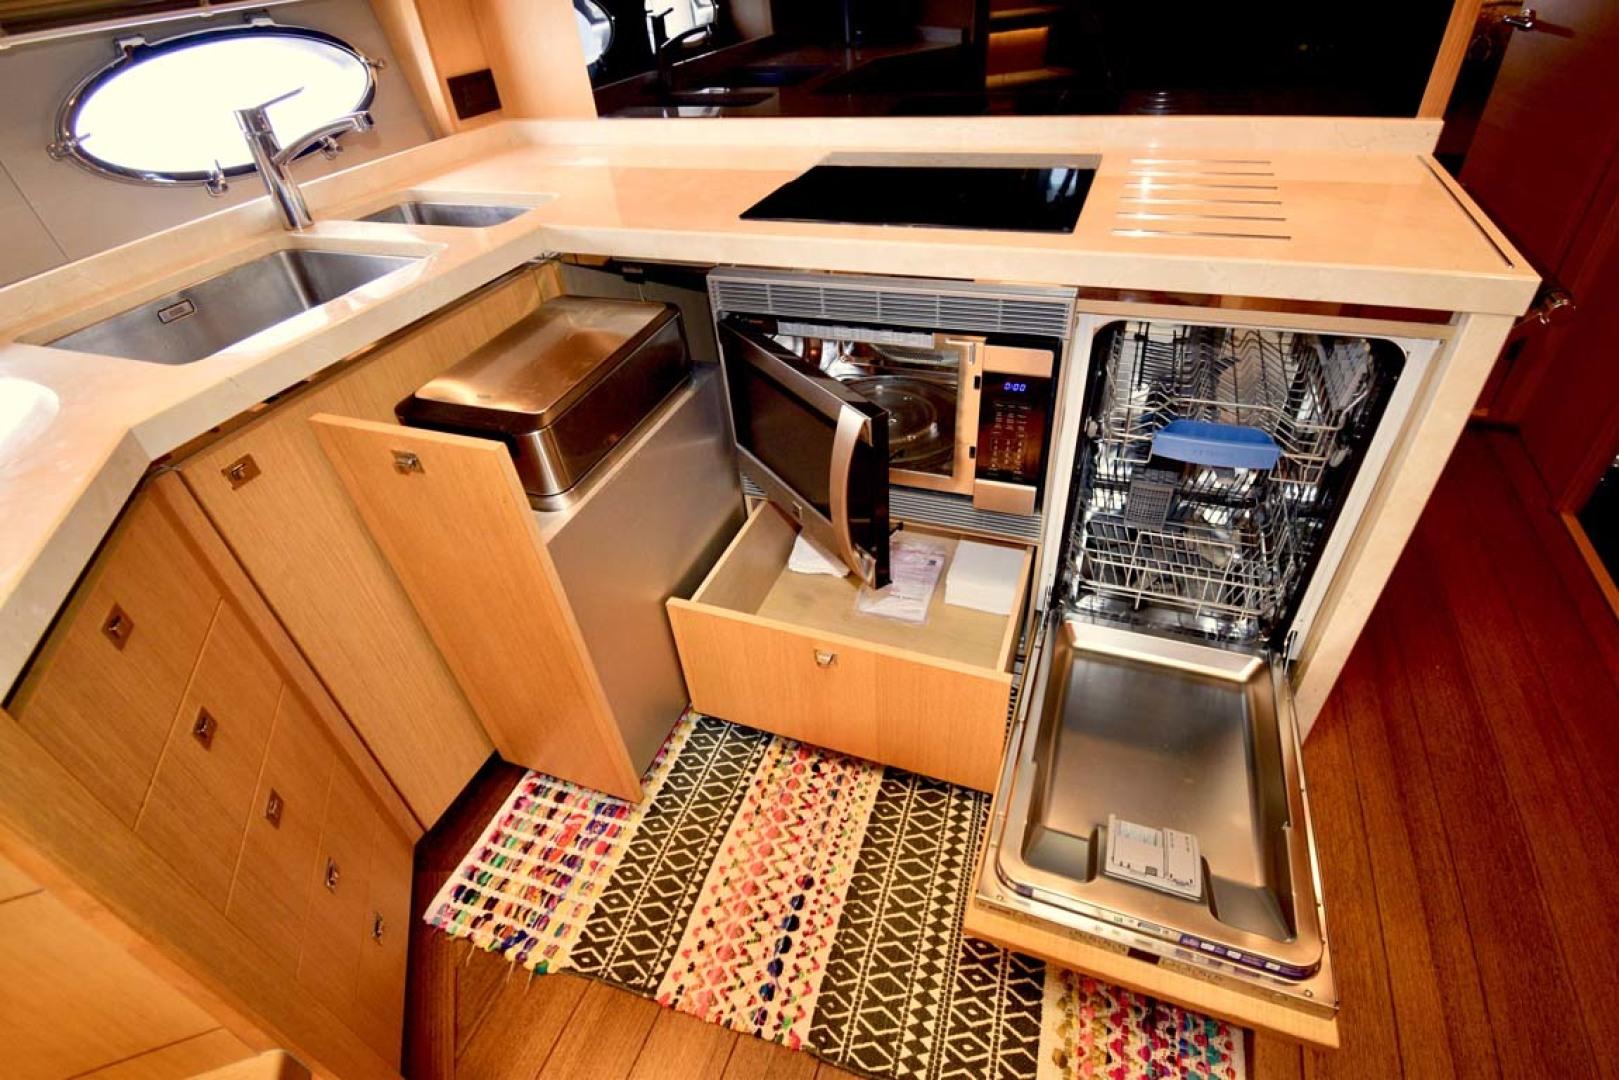 Princess-V72 2013-High Bid Destin-Florida-United States-Galley With Oven And Dishwasher-1233069 | Thumbnail